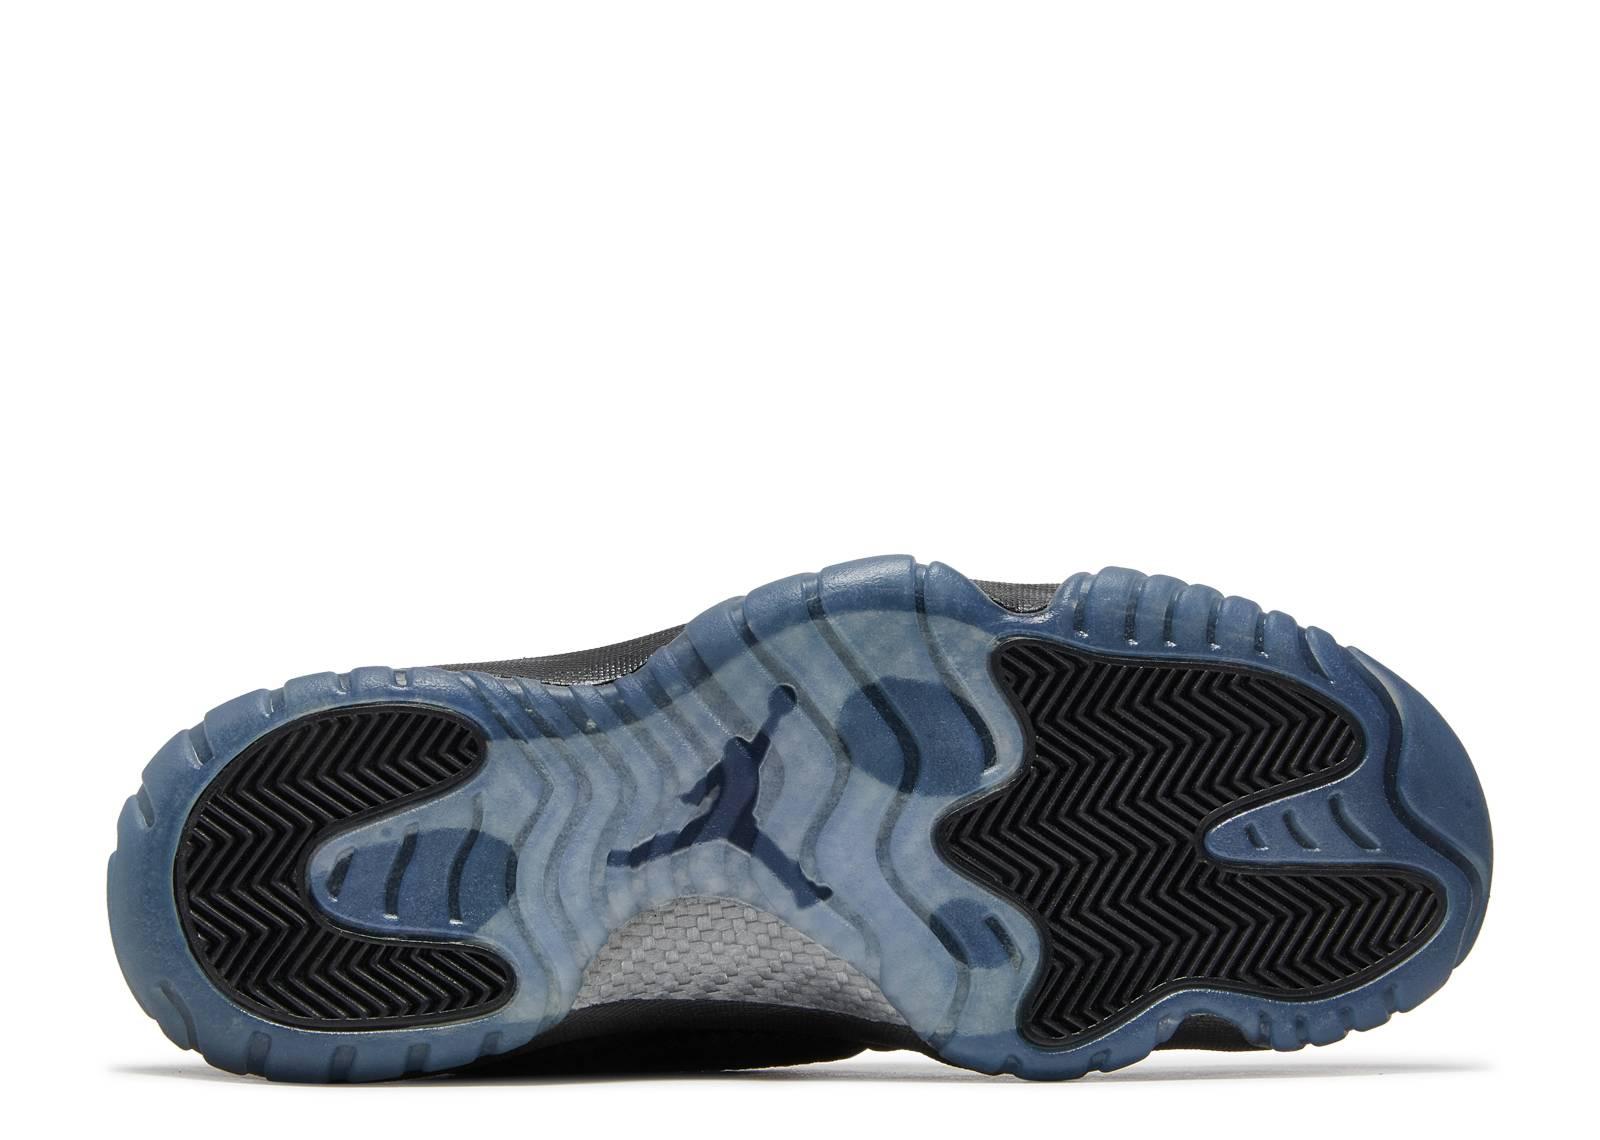 buy popular 8c745 0ac57 ... air jordan retro 9 gamma blue silver ...